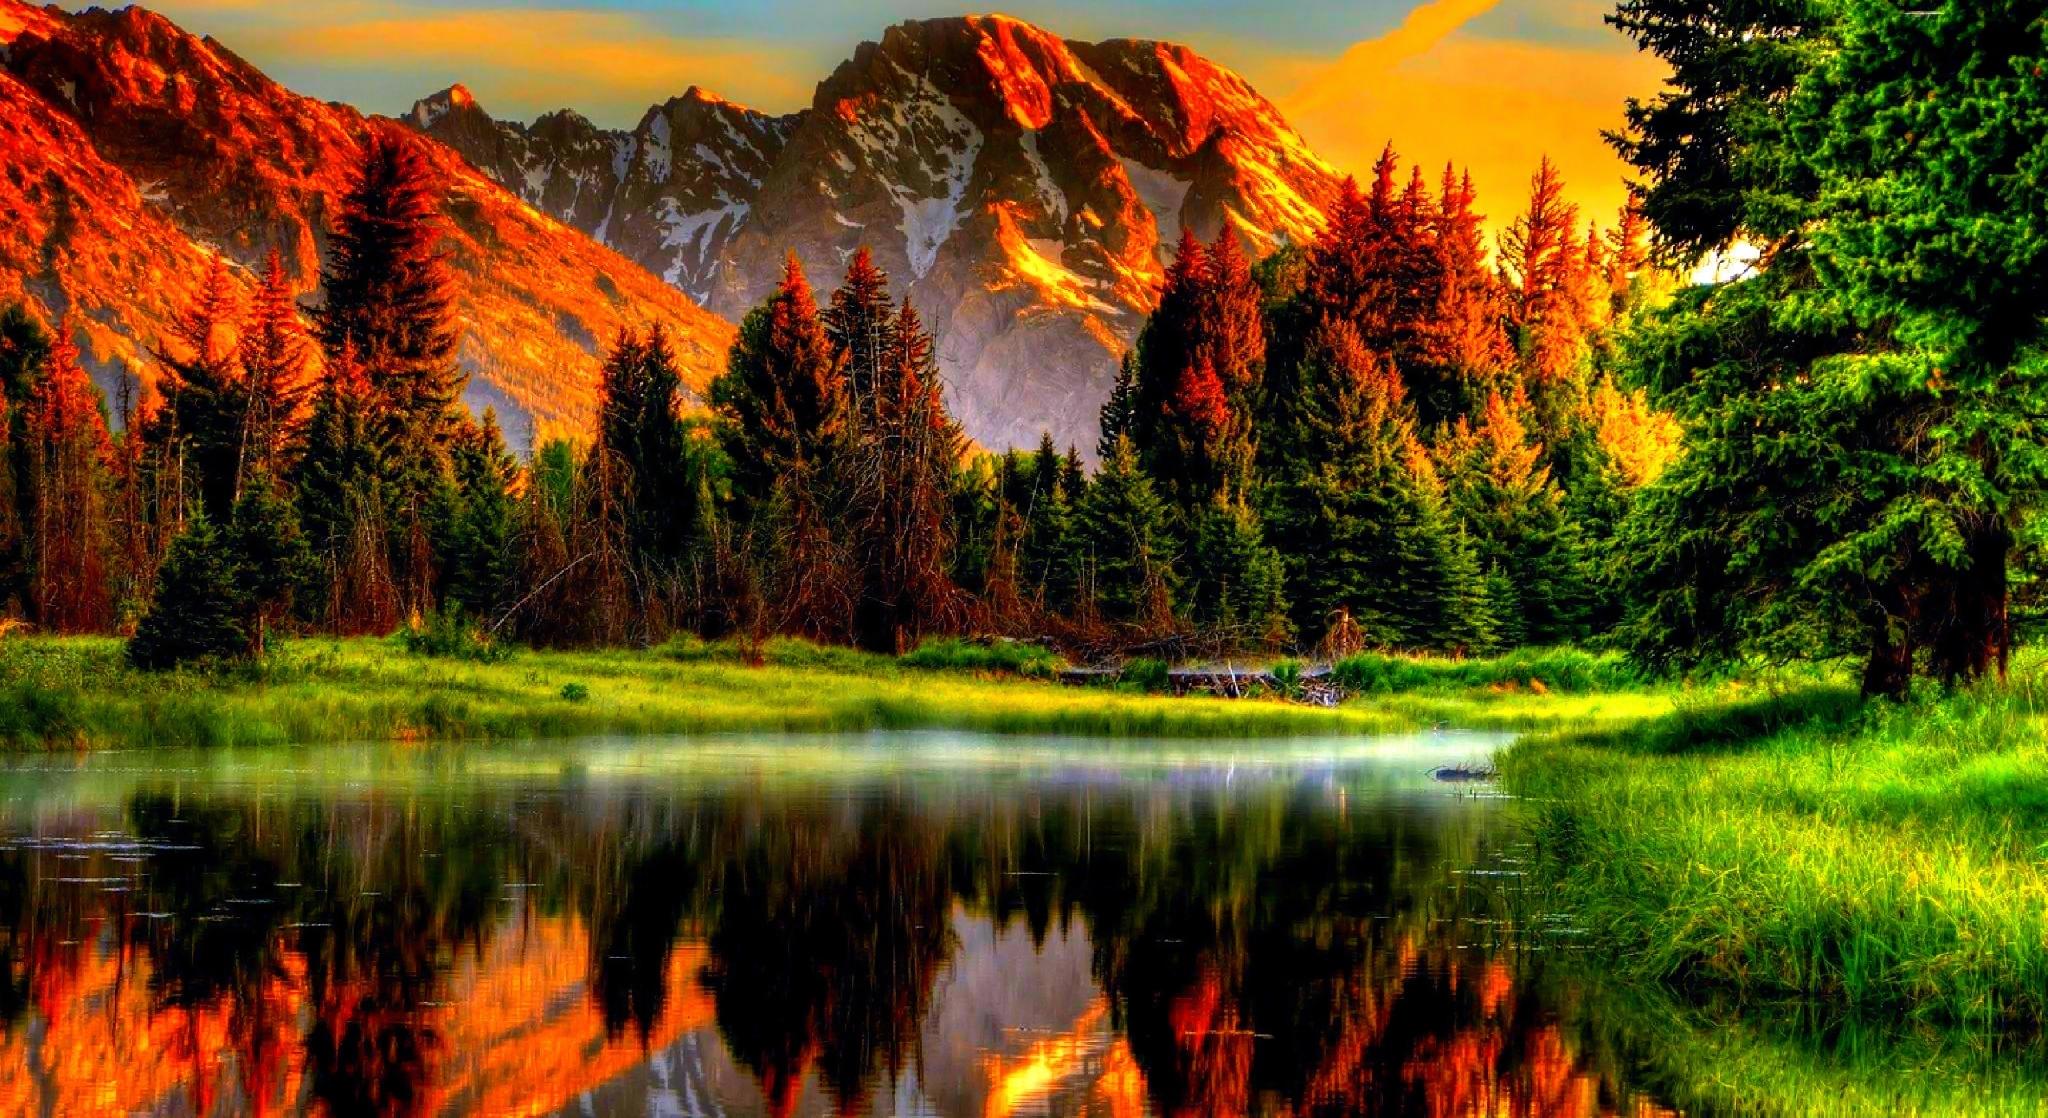 desktop backgrounds scenery group (93+)